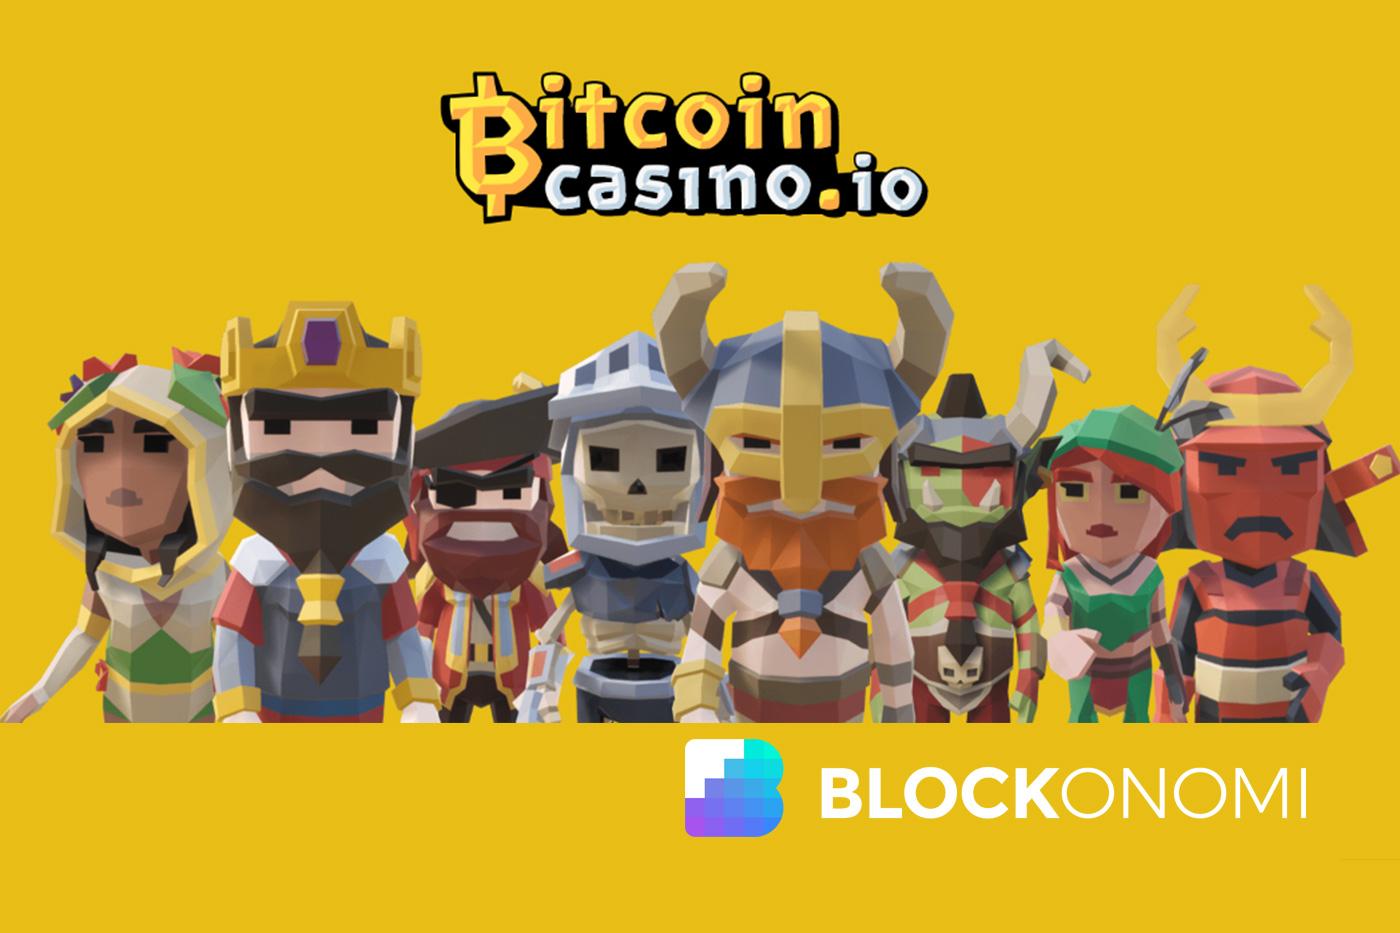 Wild joker bitcoin casino free no deposit bonus codes 2020